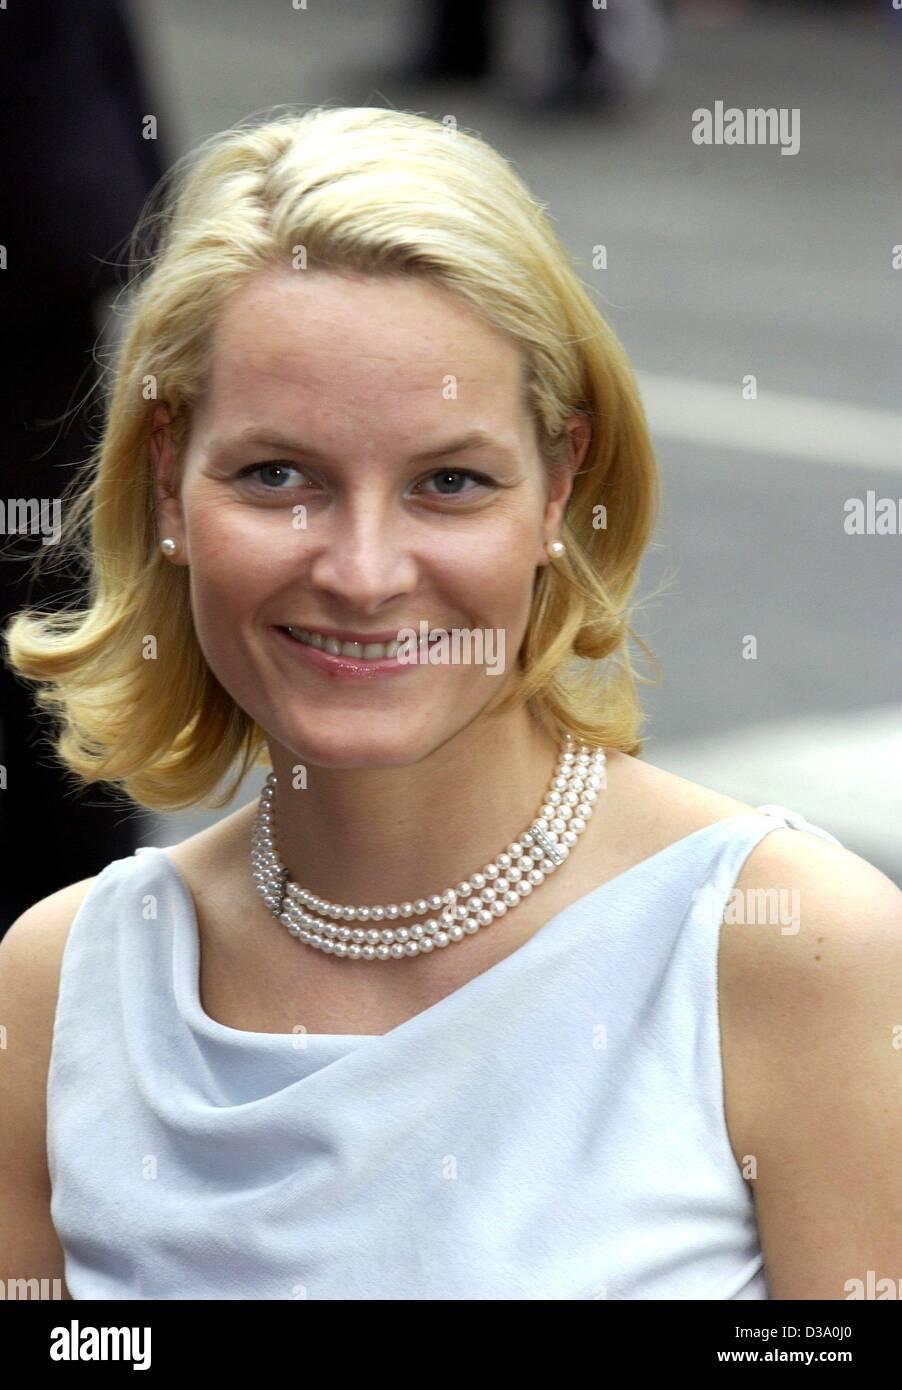 Dpa Norwegian Crown Princess Mette Marit Smiles As She